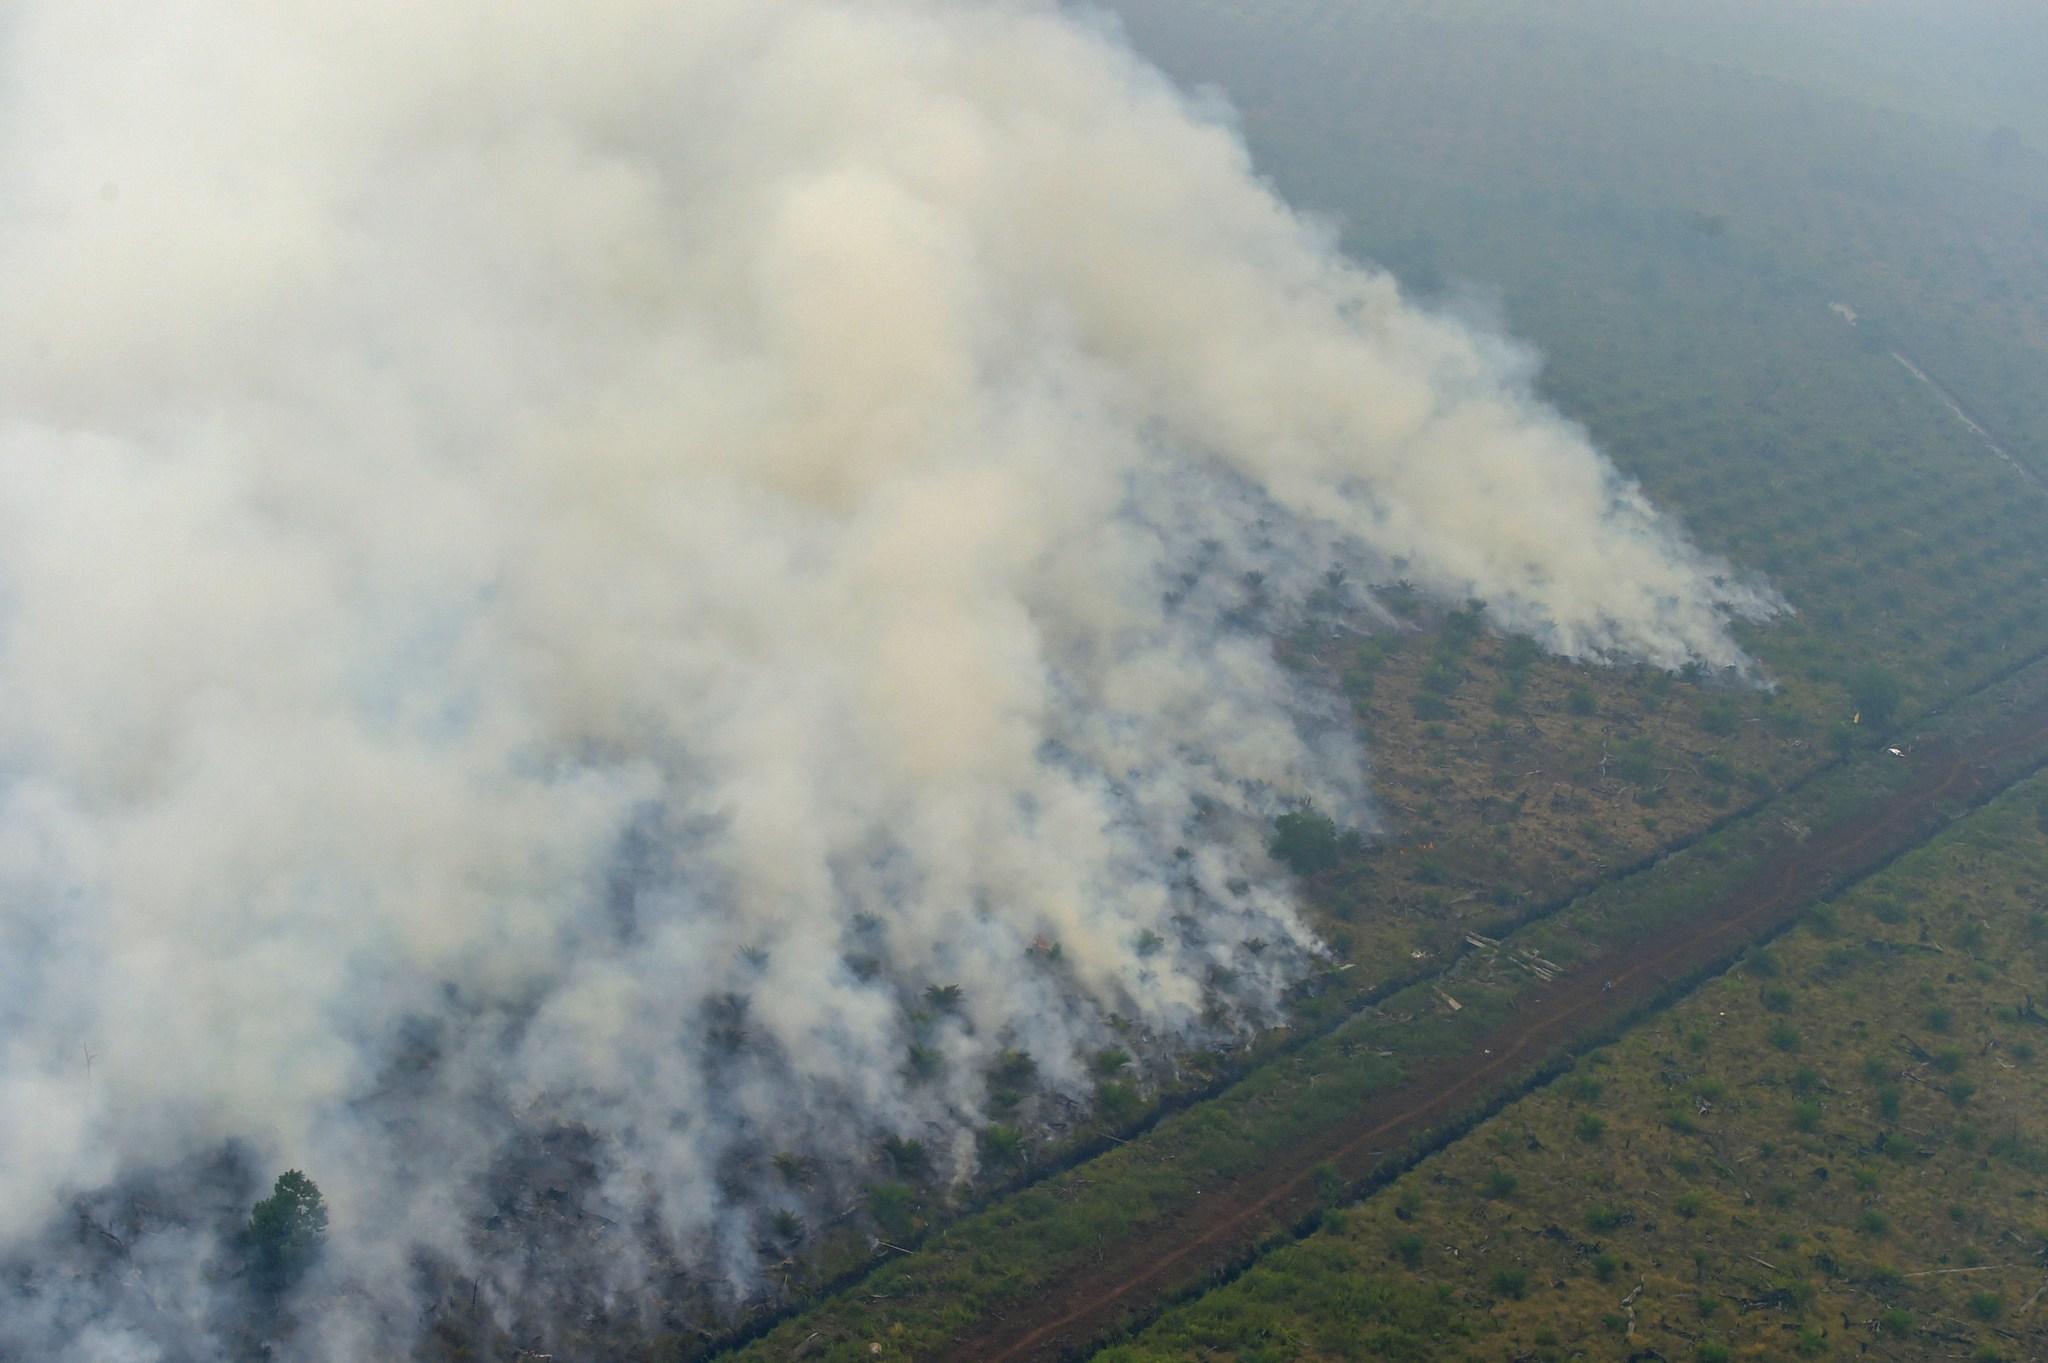 la-fg-toxic-haze-in-southeast-asia-pictu